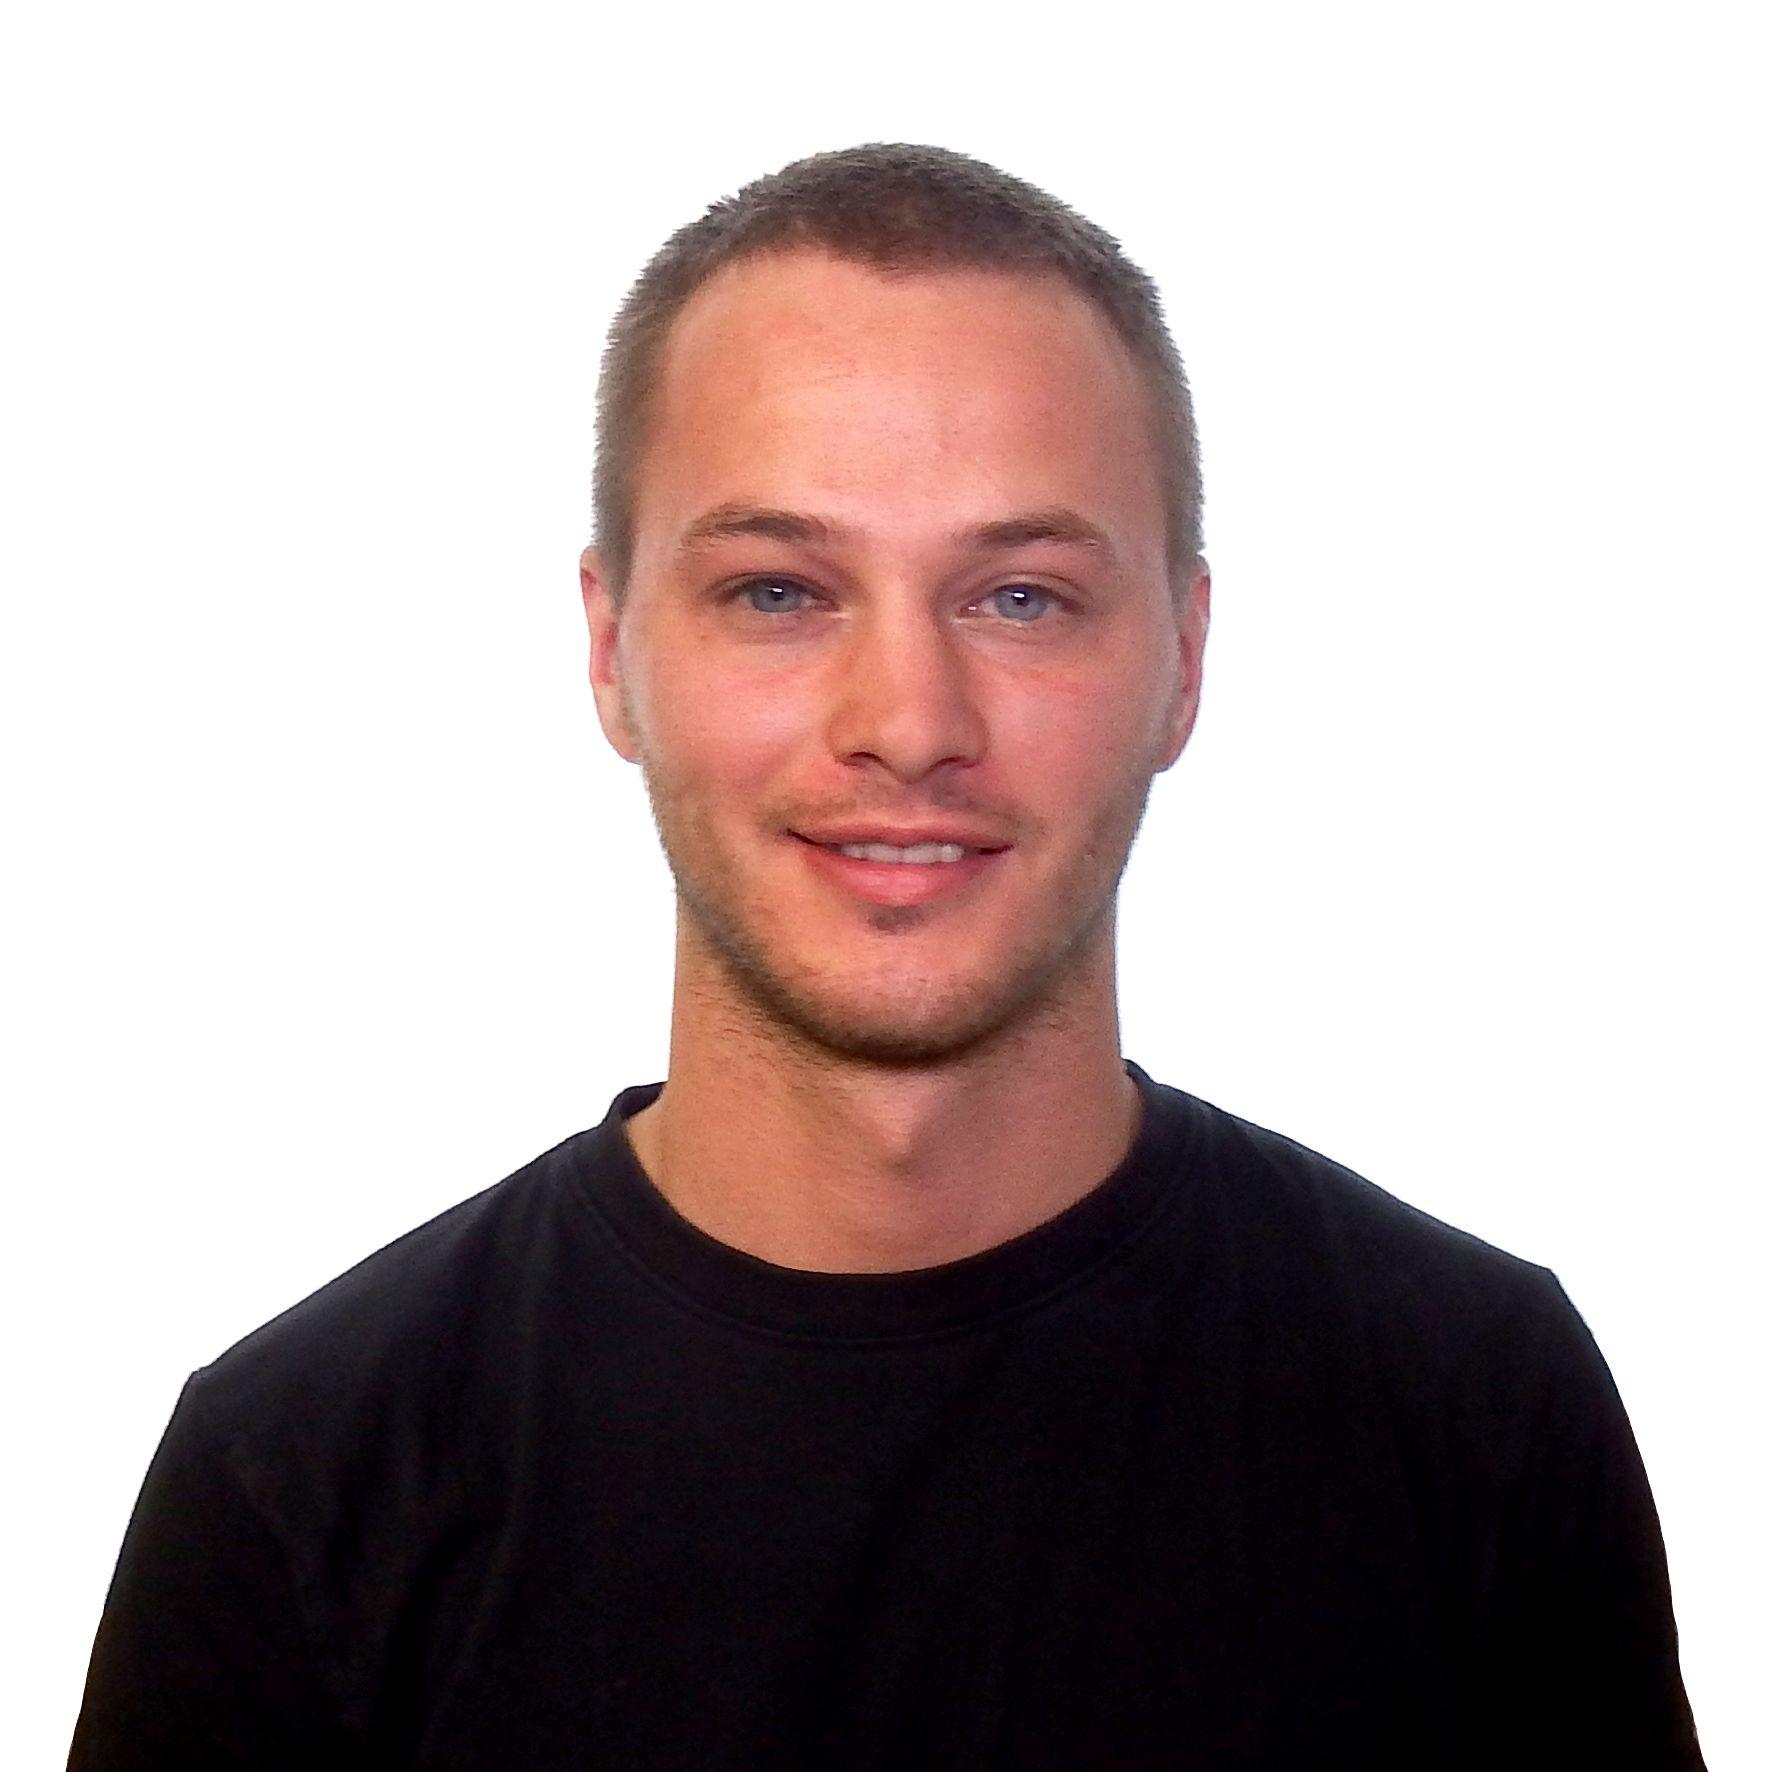 Follow the Weather founder, Chris Whitehead